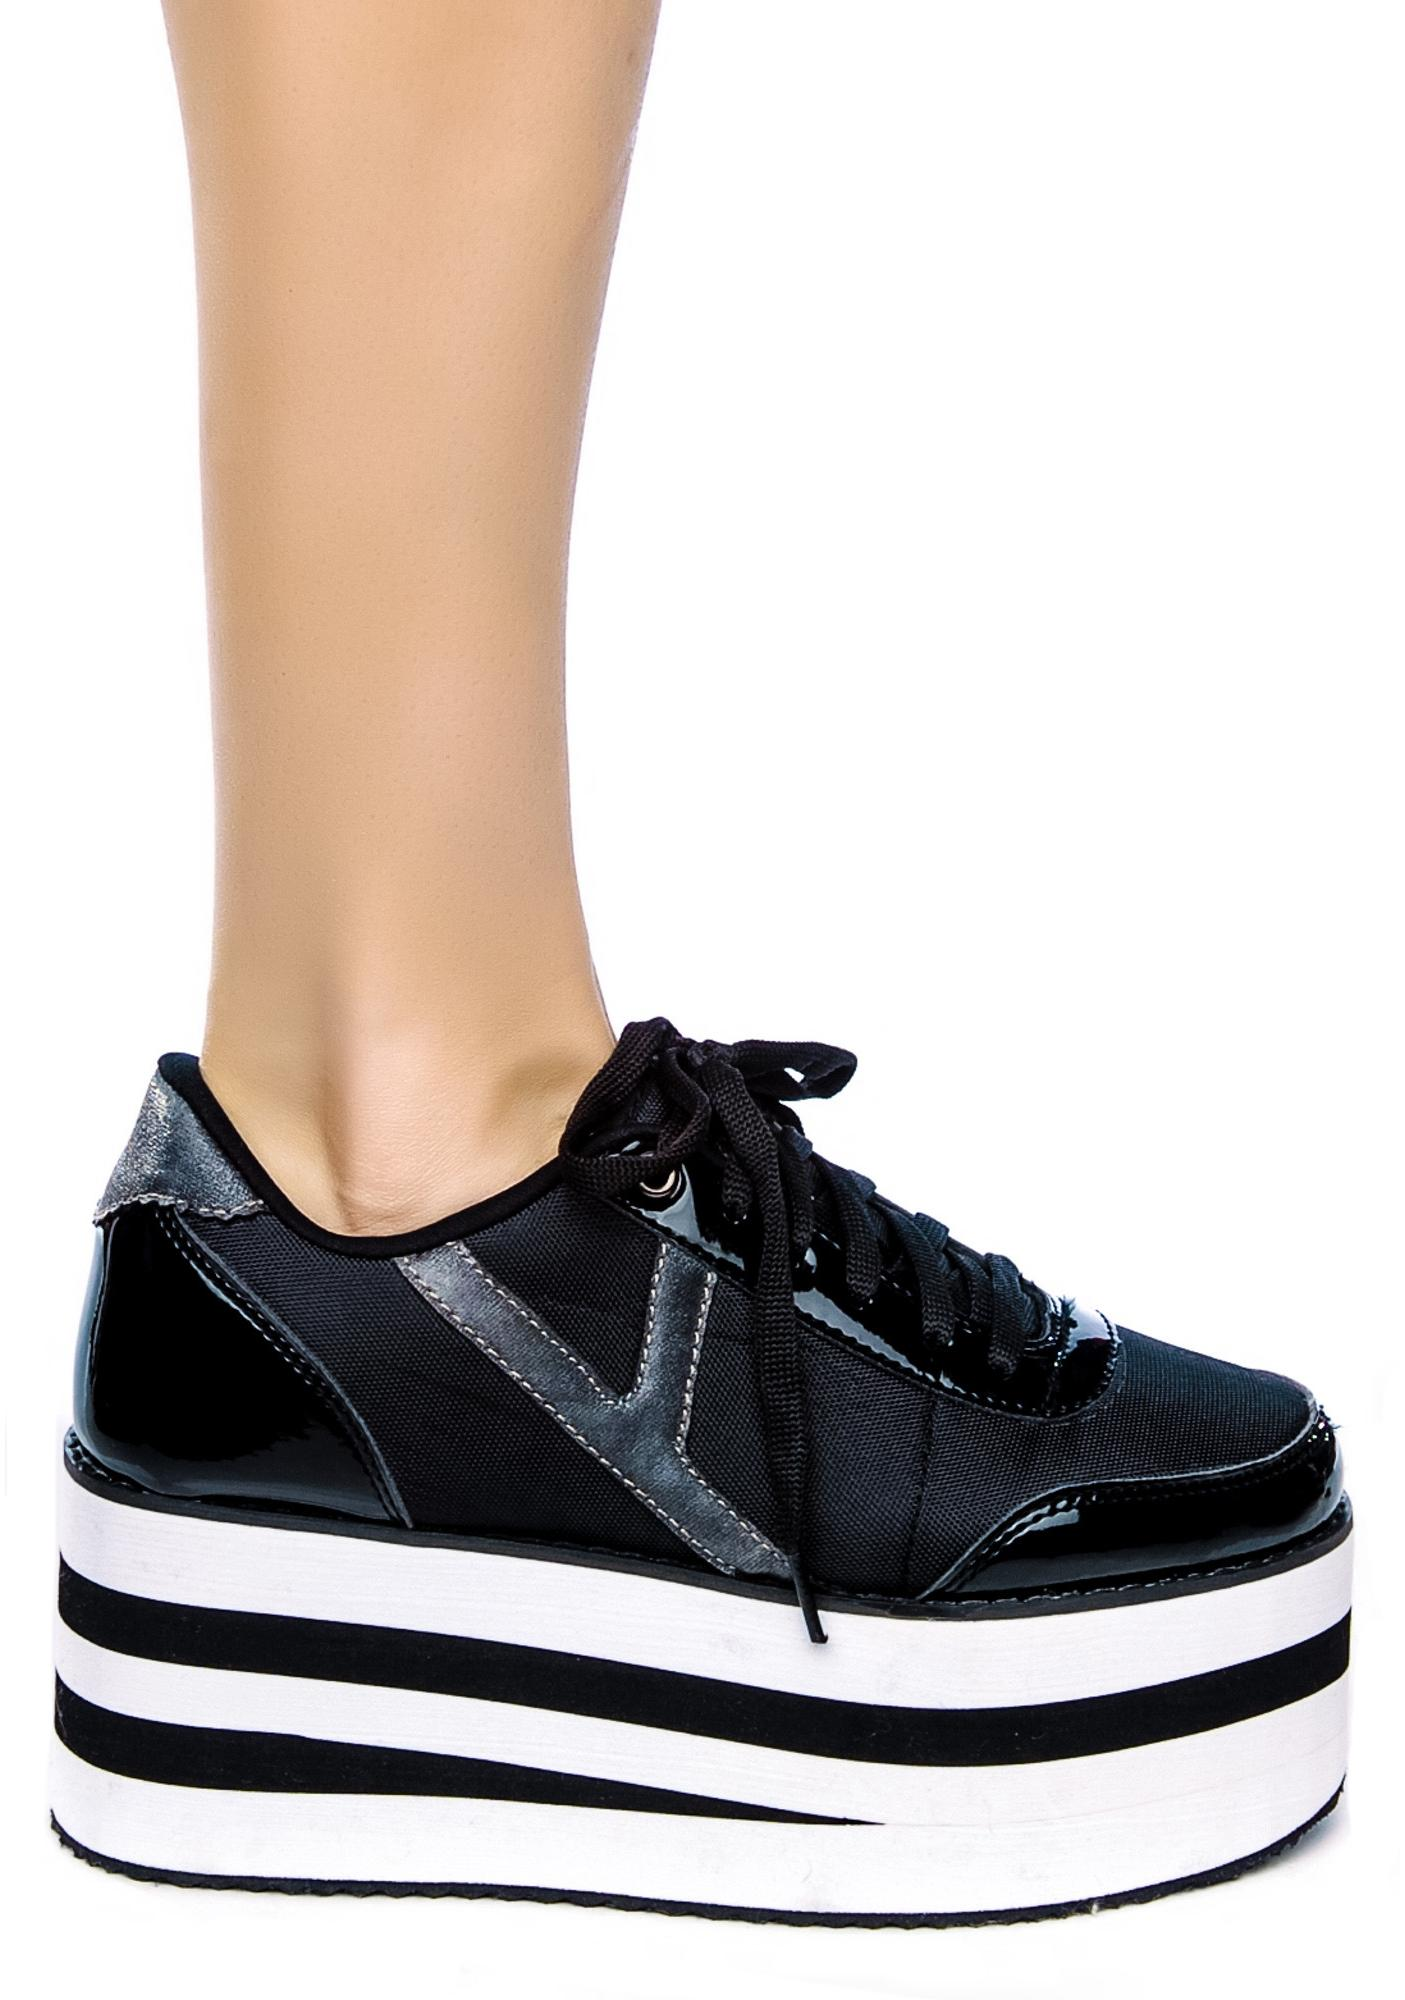 Y.R.U. Krazii Platform Sneakers | Dolls Kill